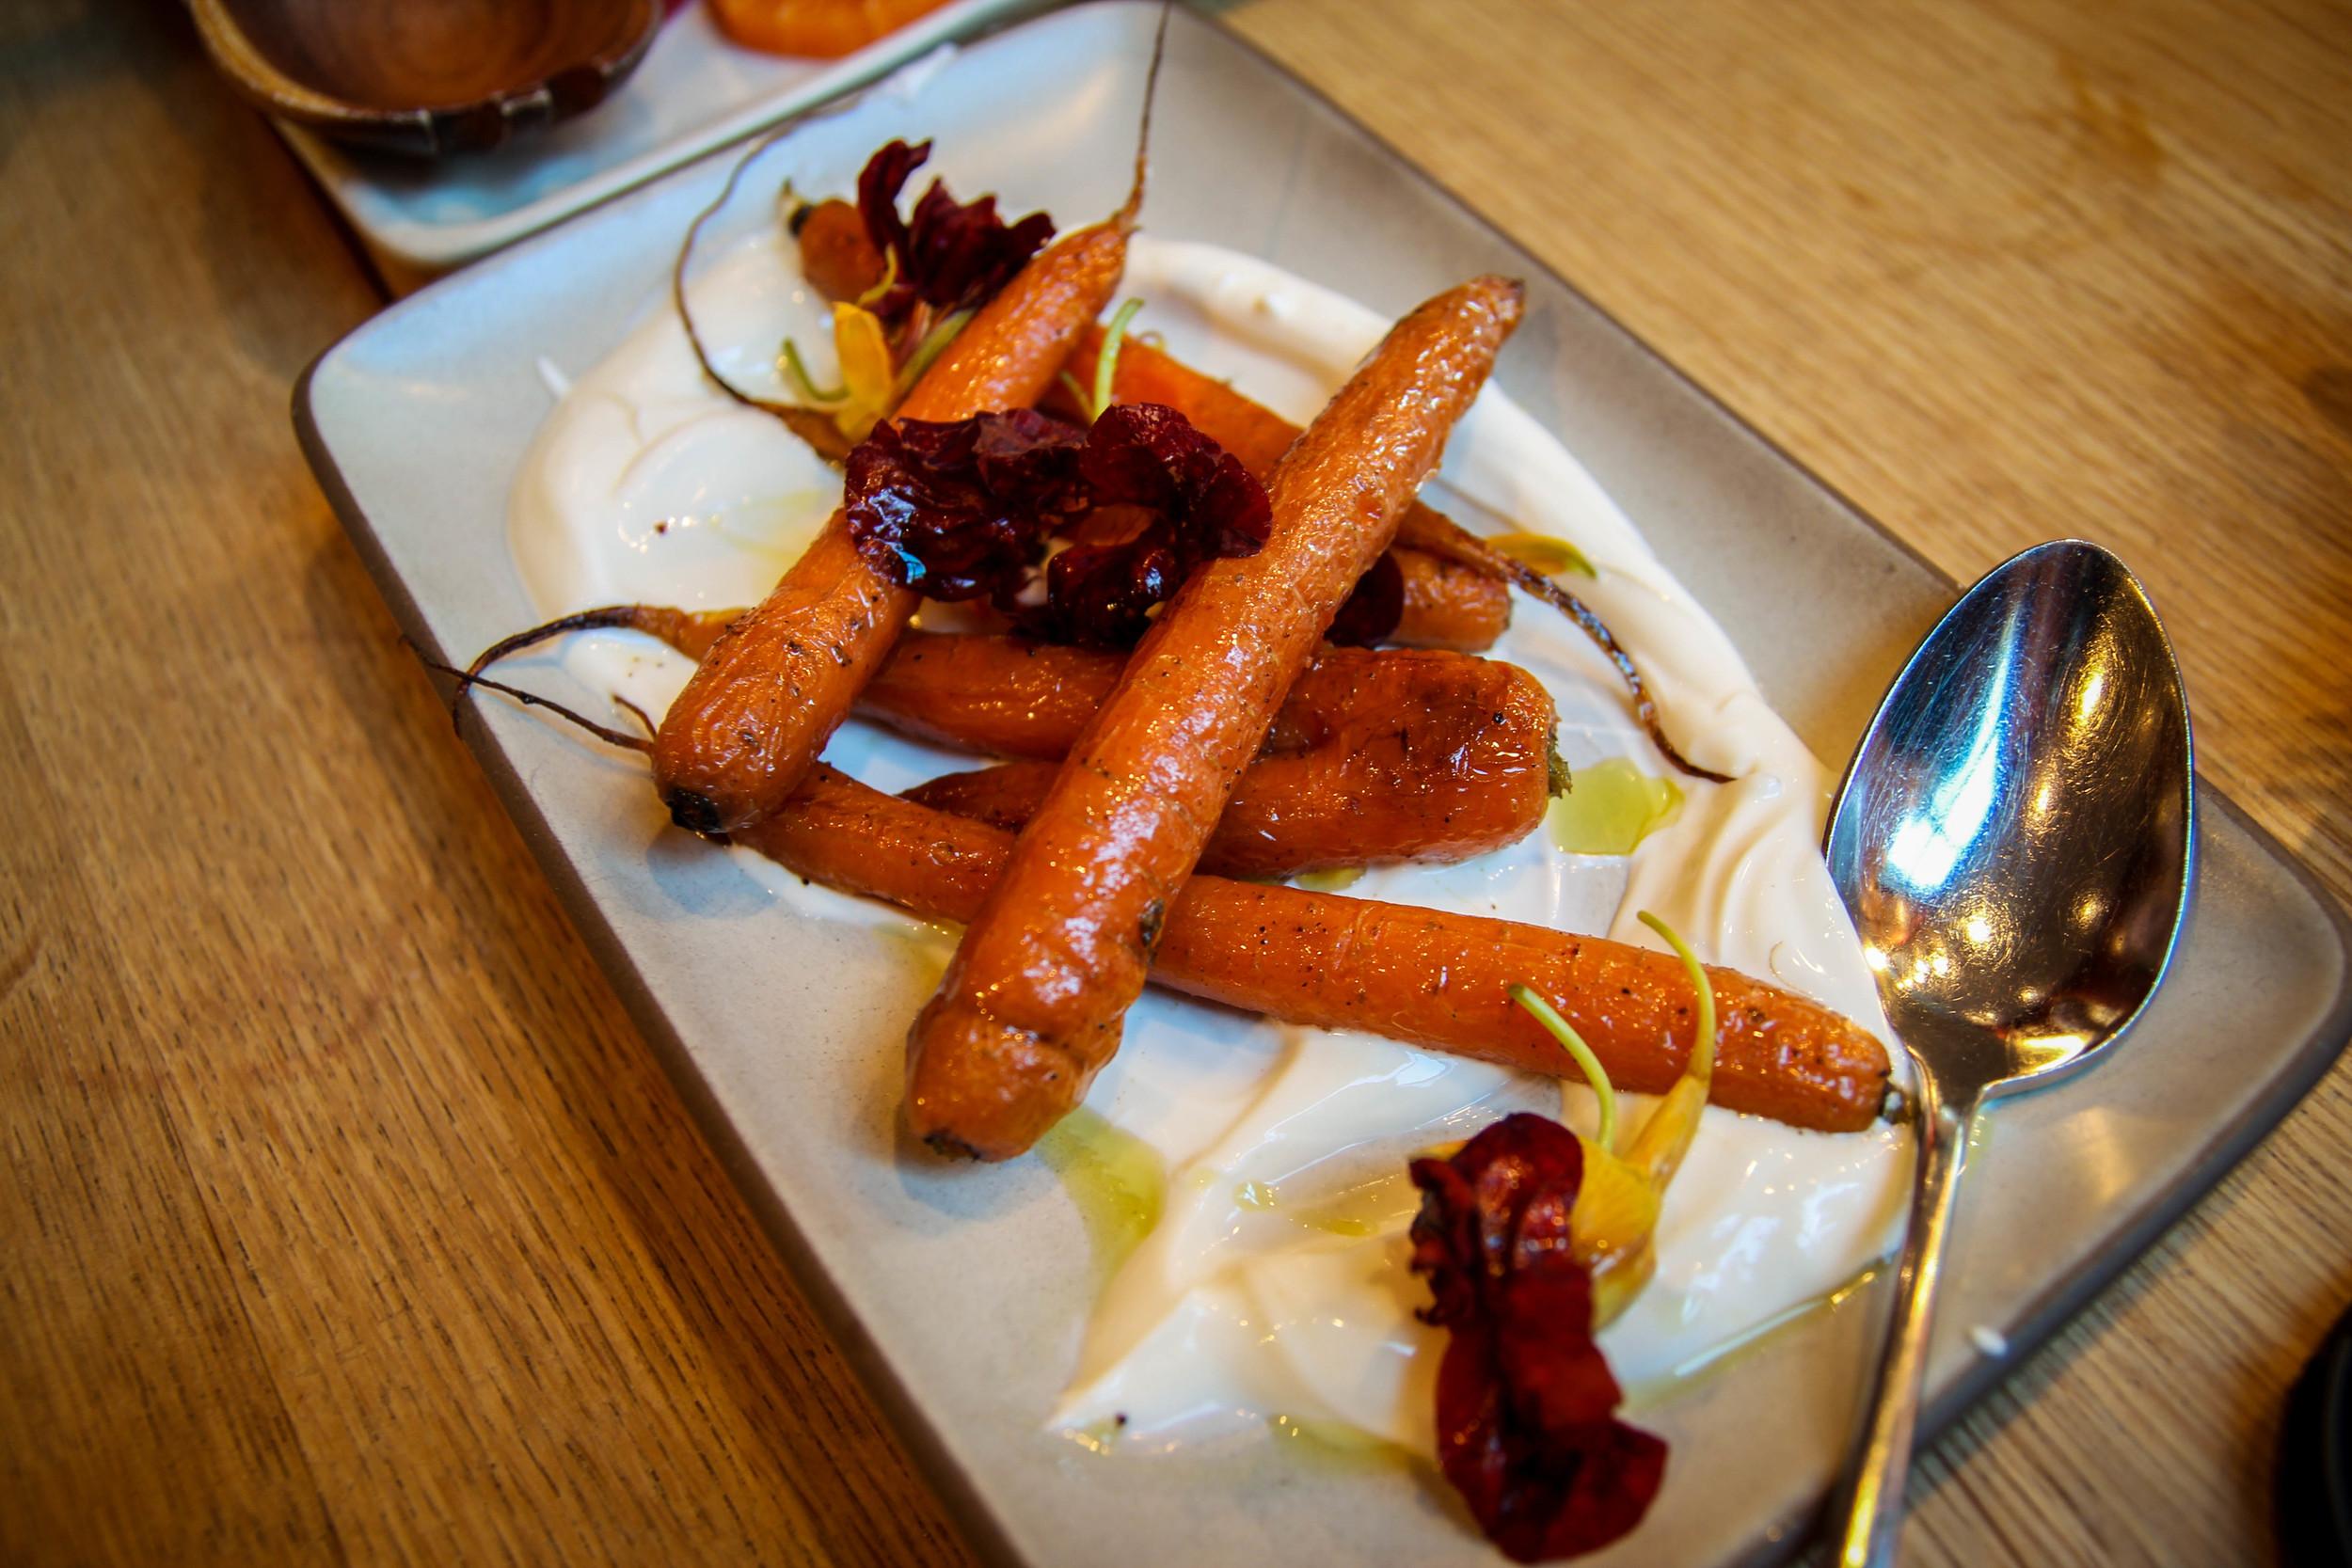 Roasted carrots with Greek yogurt, lemon verbena, and nasturtium flowers